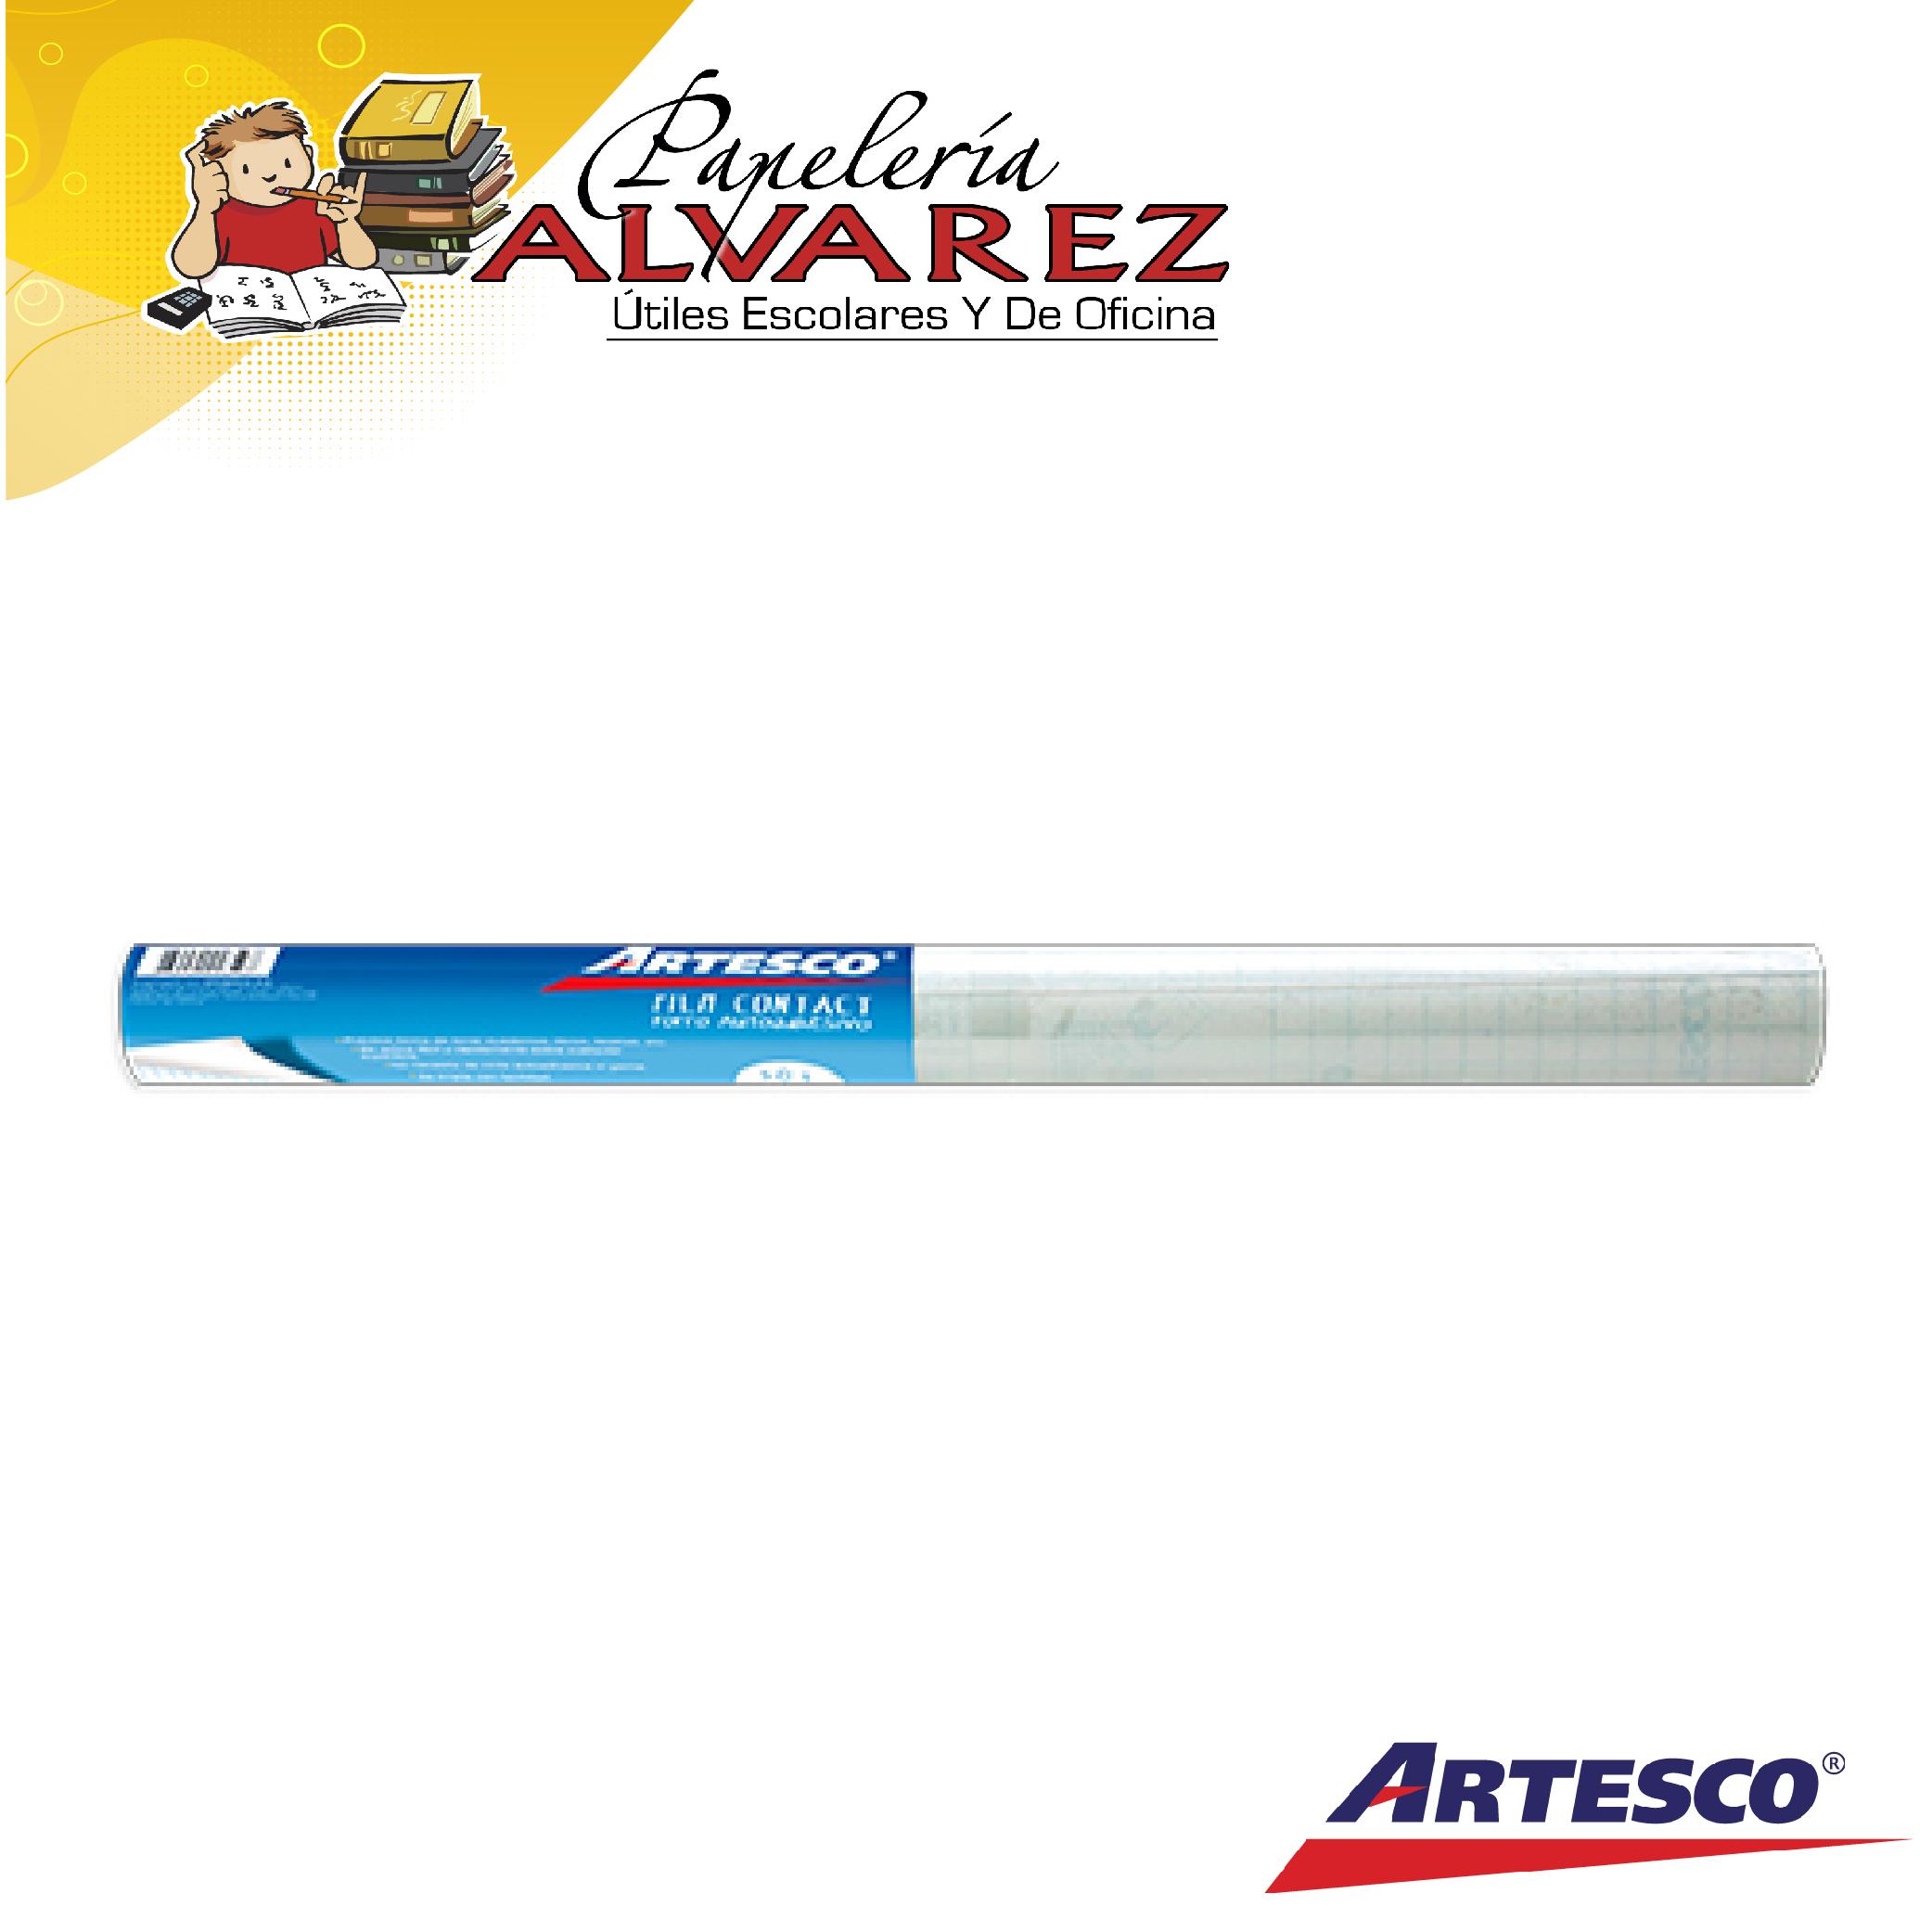 CONTACT ARTESCO TRANSPARENTE X 3MTS